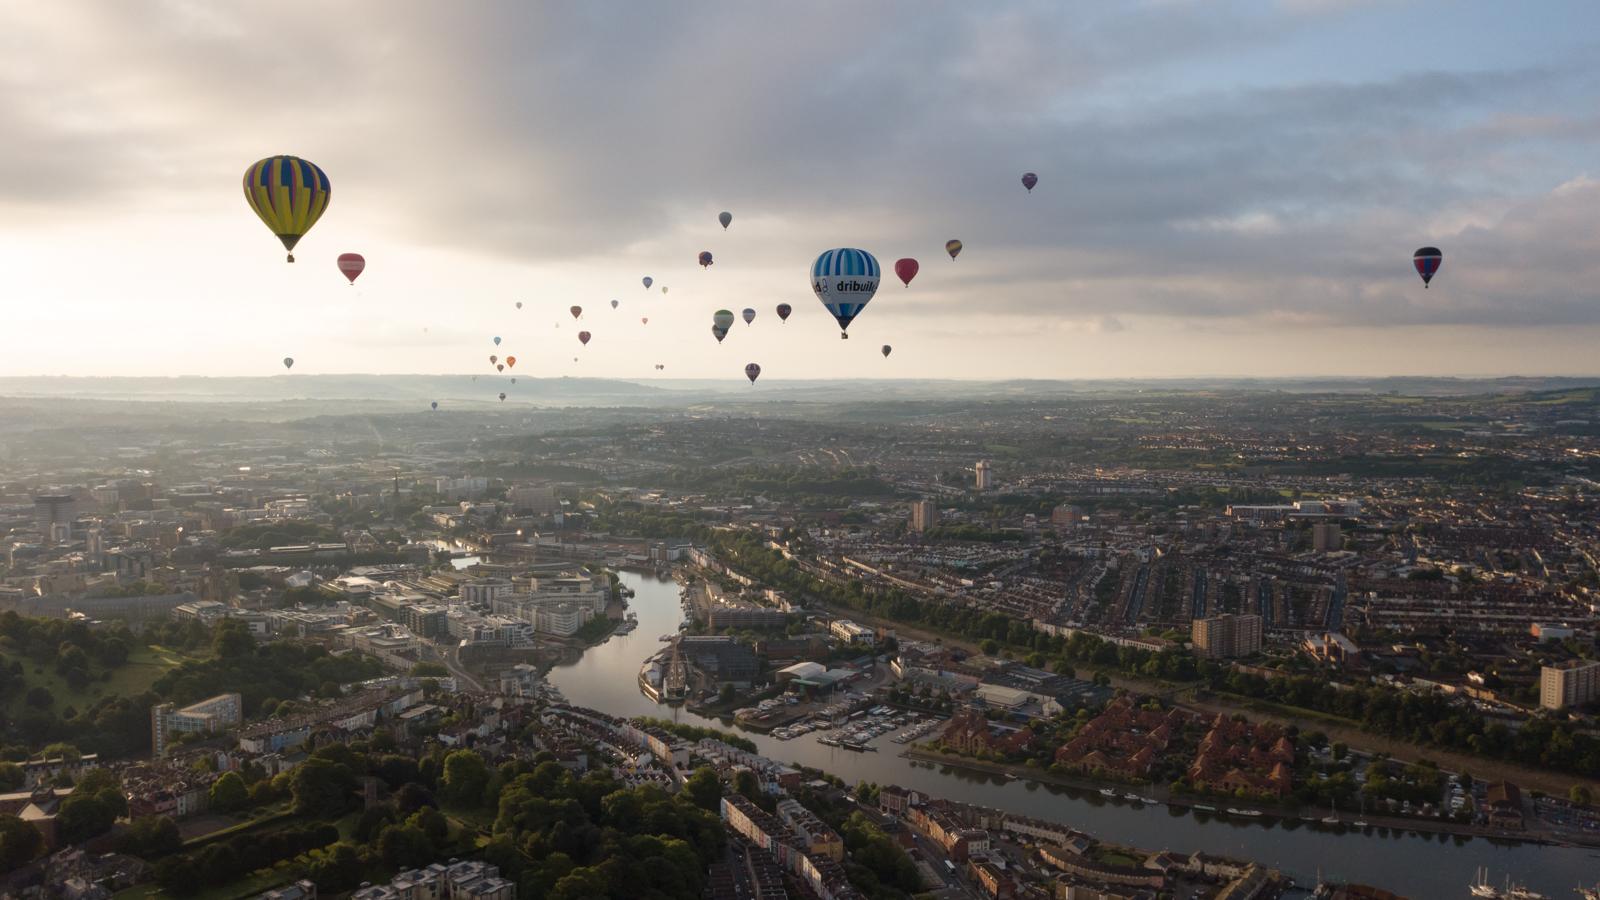 Balloon Festival - Bristol - 2017 (1 of 1)